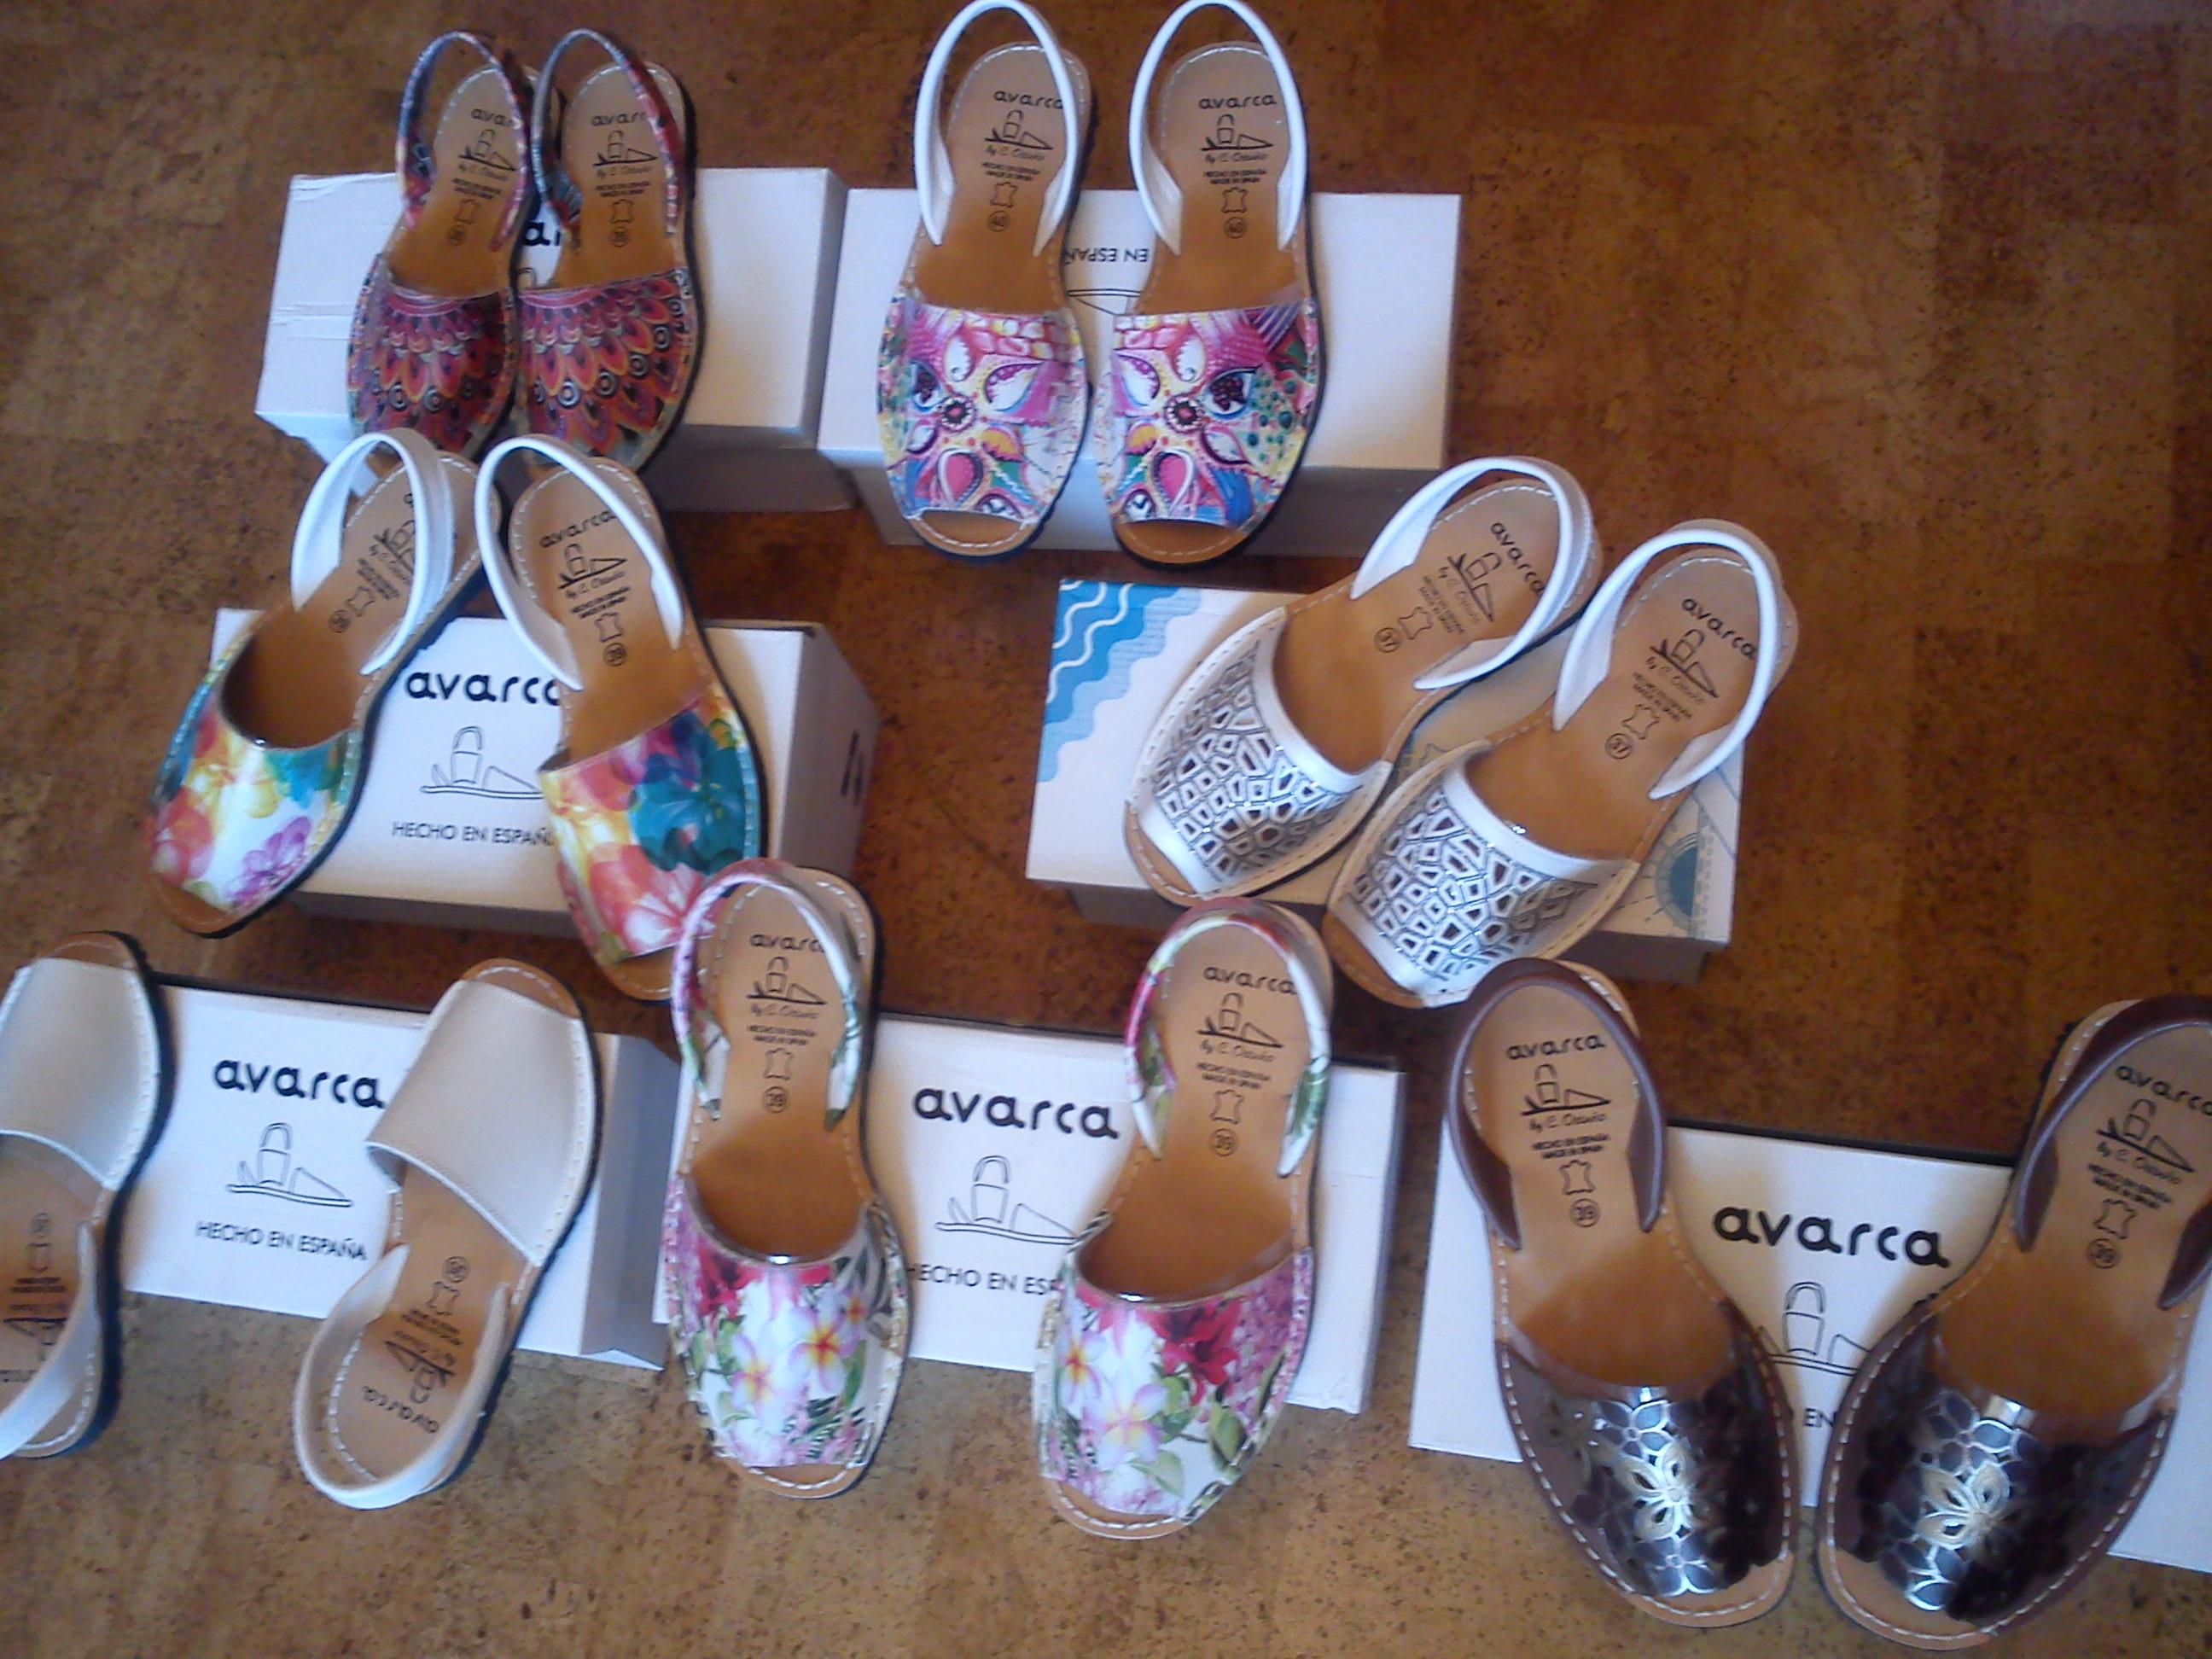 Сбор заказов. Быстрый сбор. Пляжная испанская обувь Абаркасы. Выкуп-2